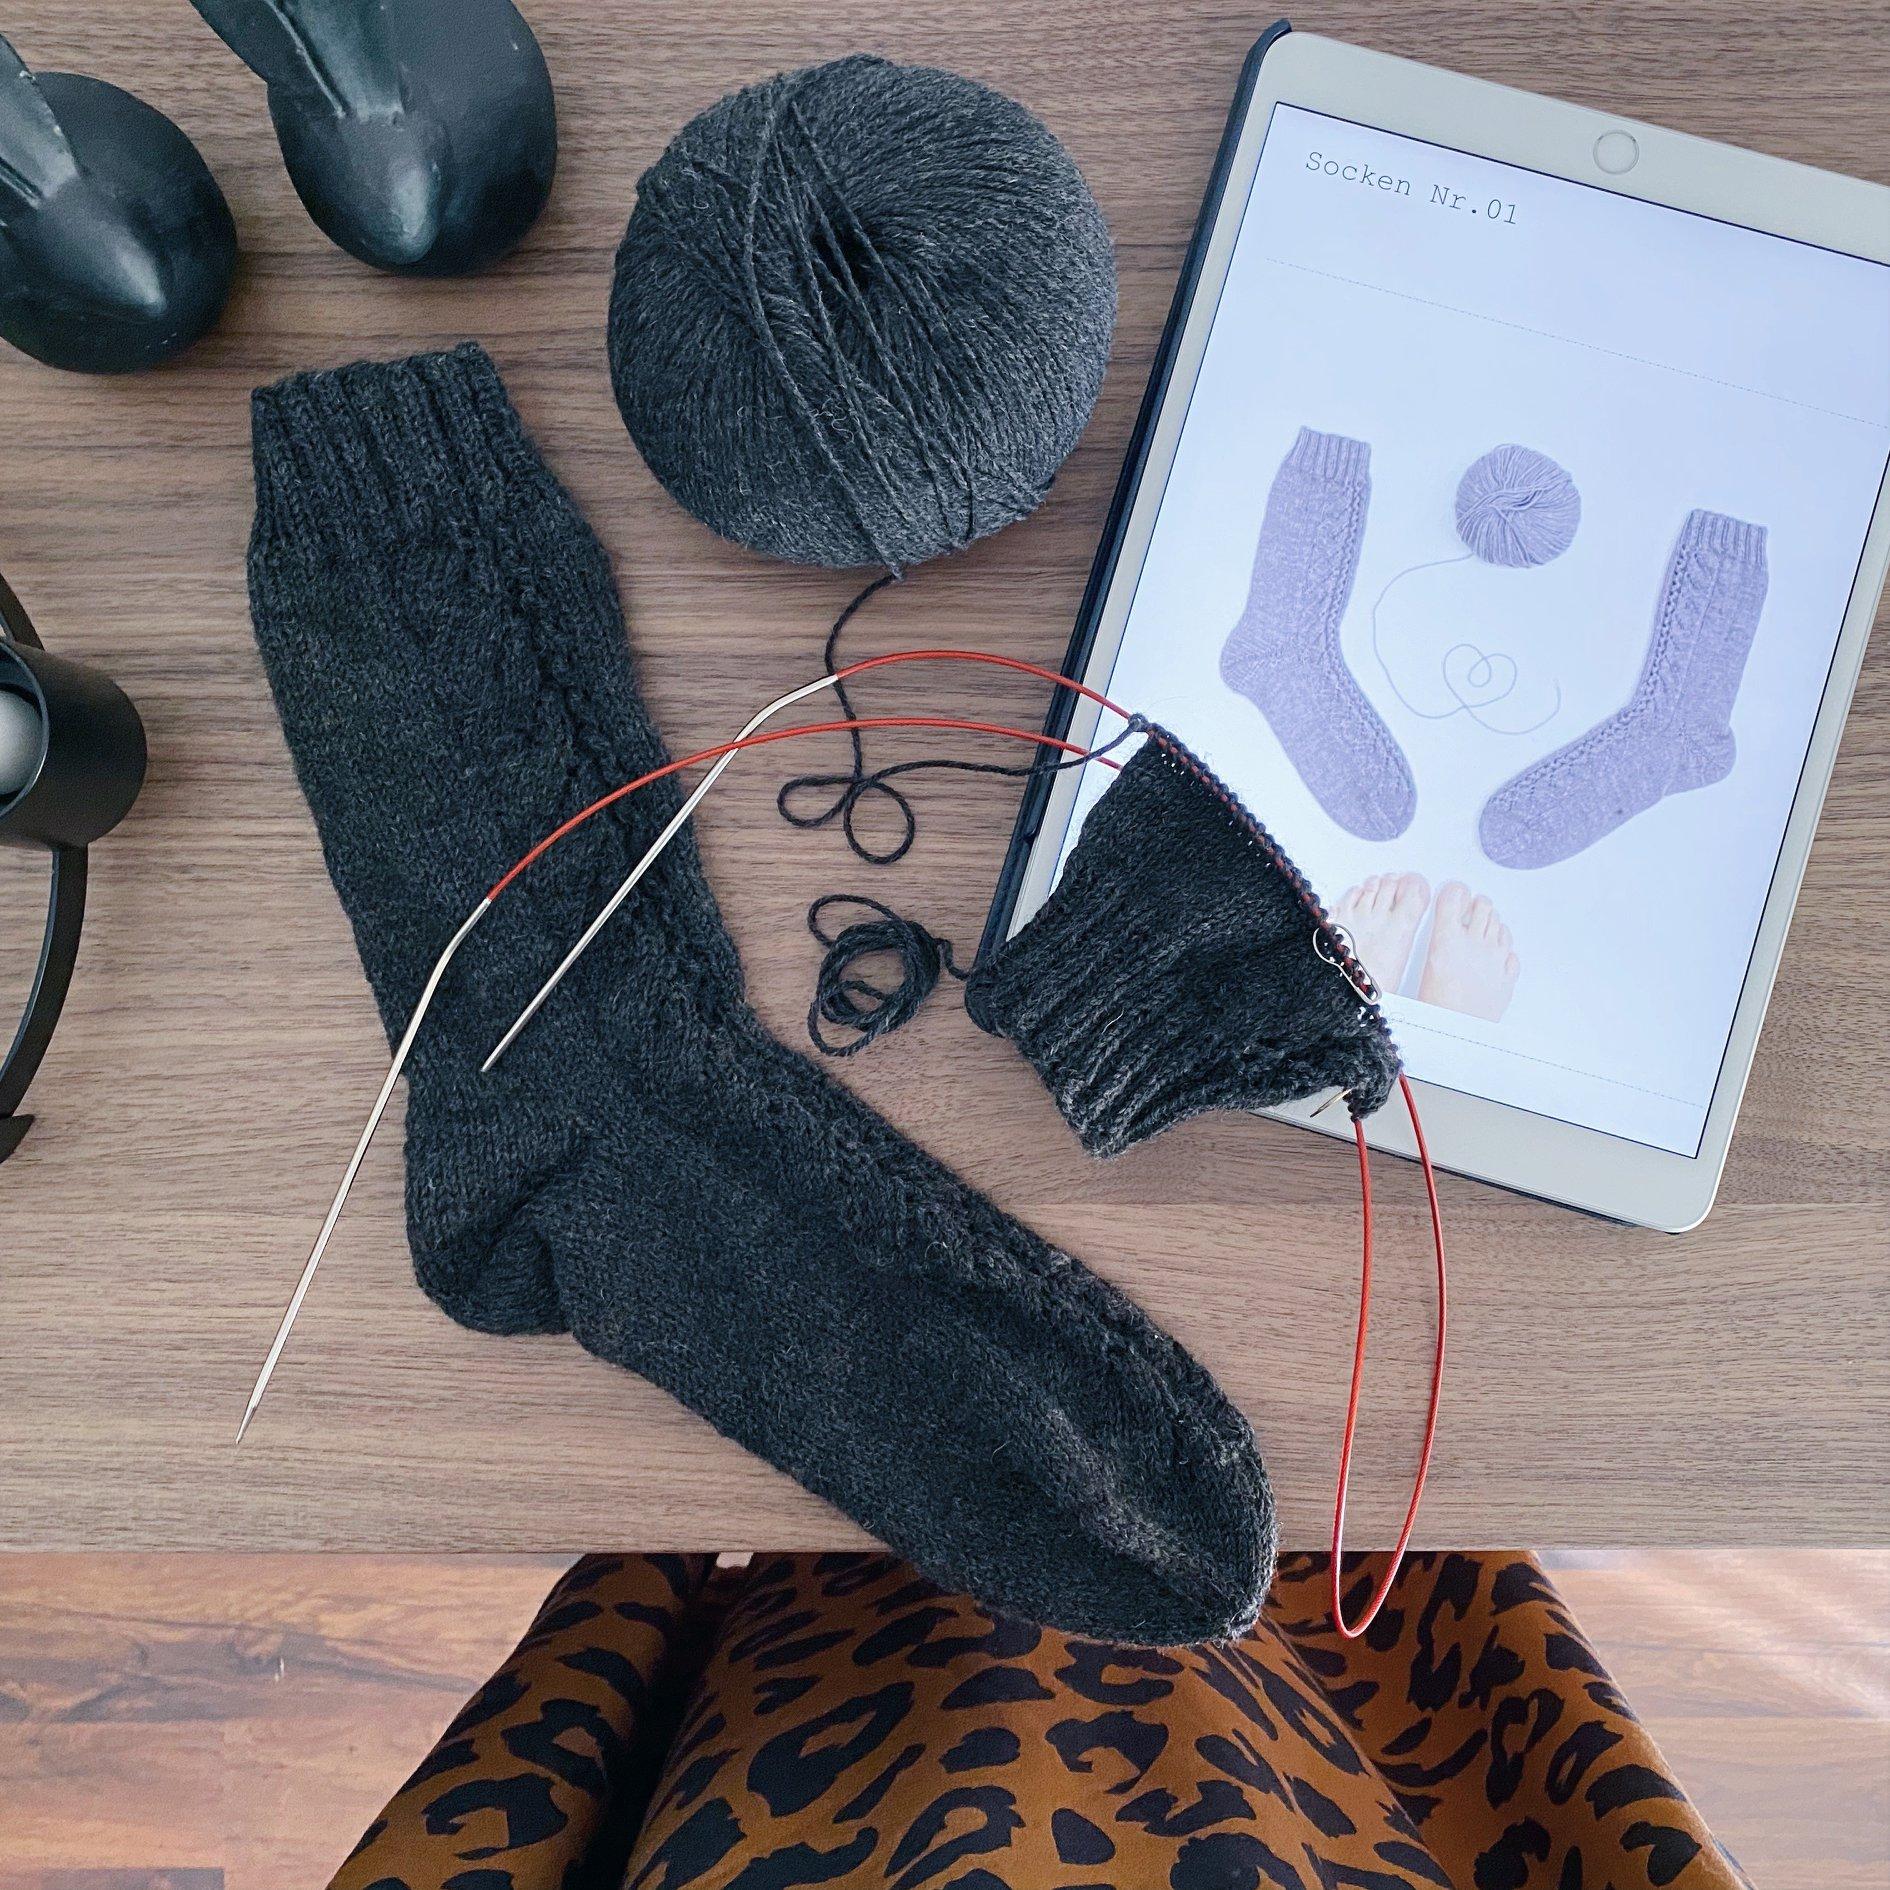 Rosa P. - Socken No. 1